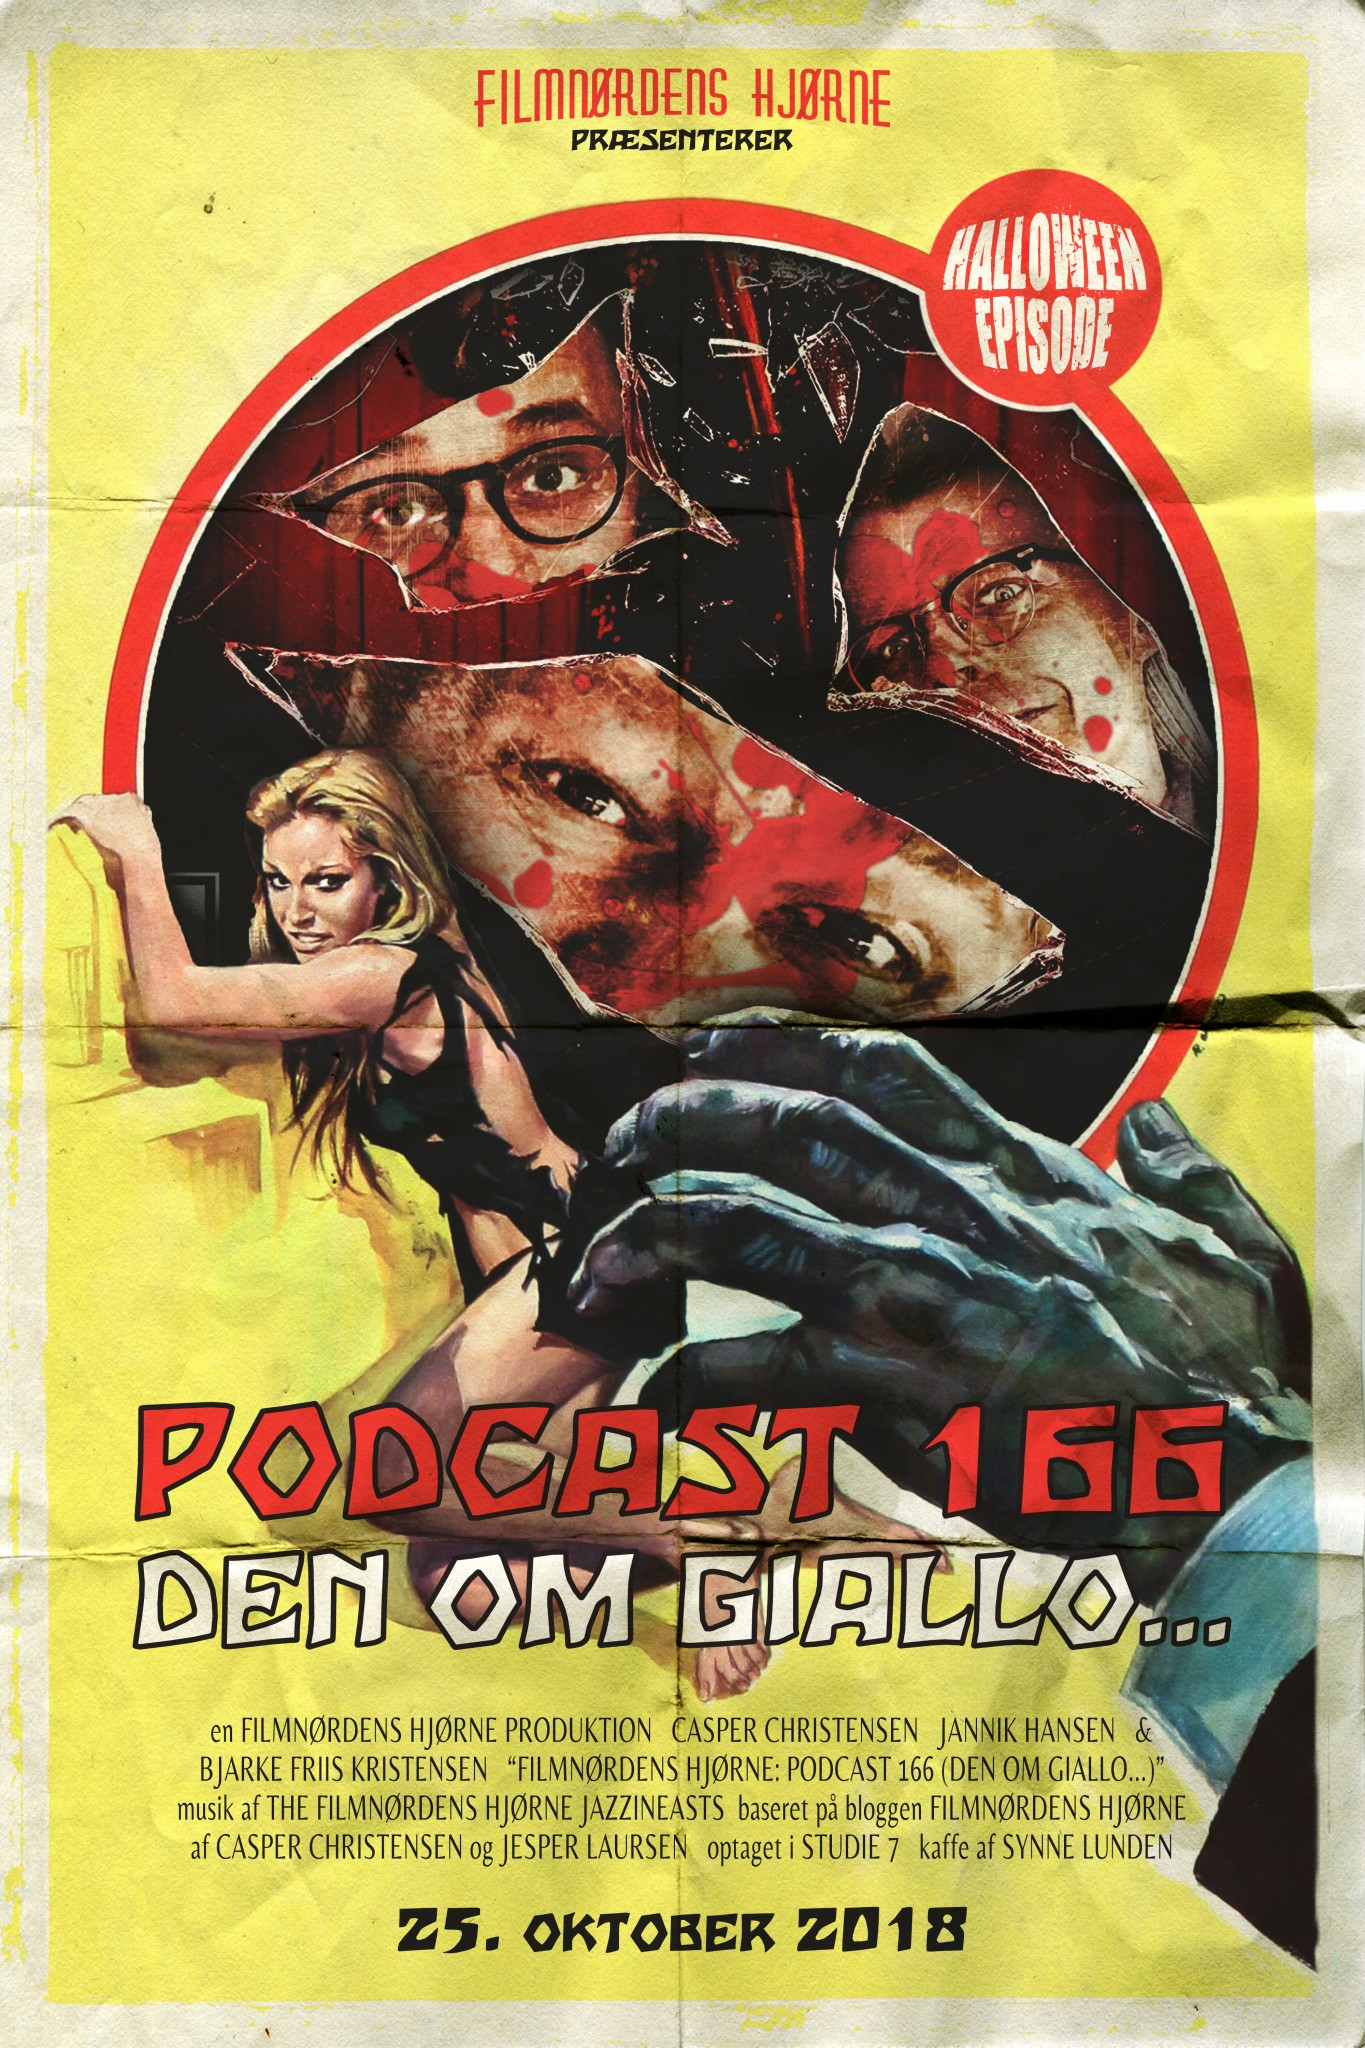 Podcast 166